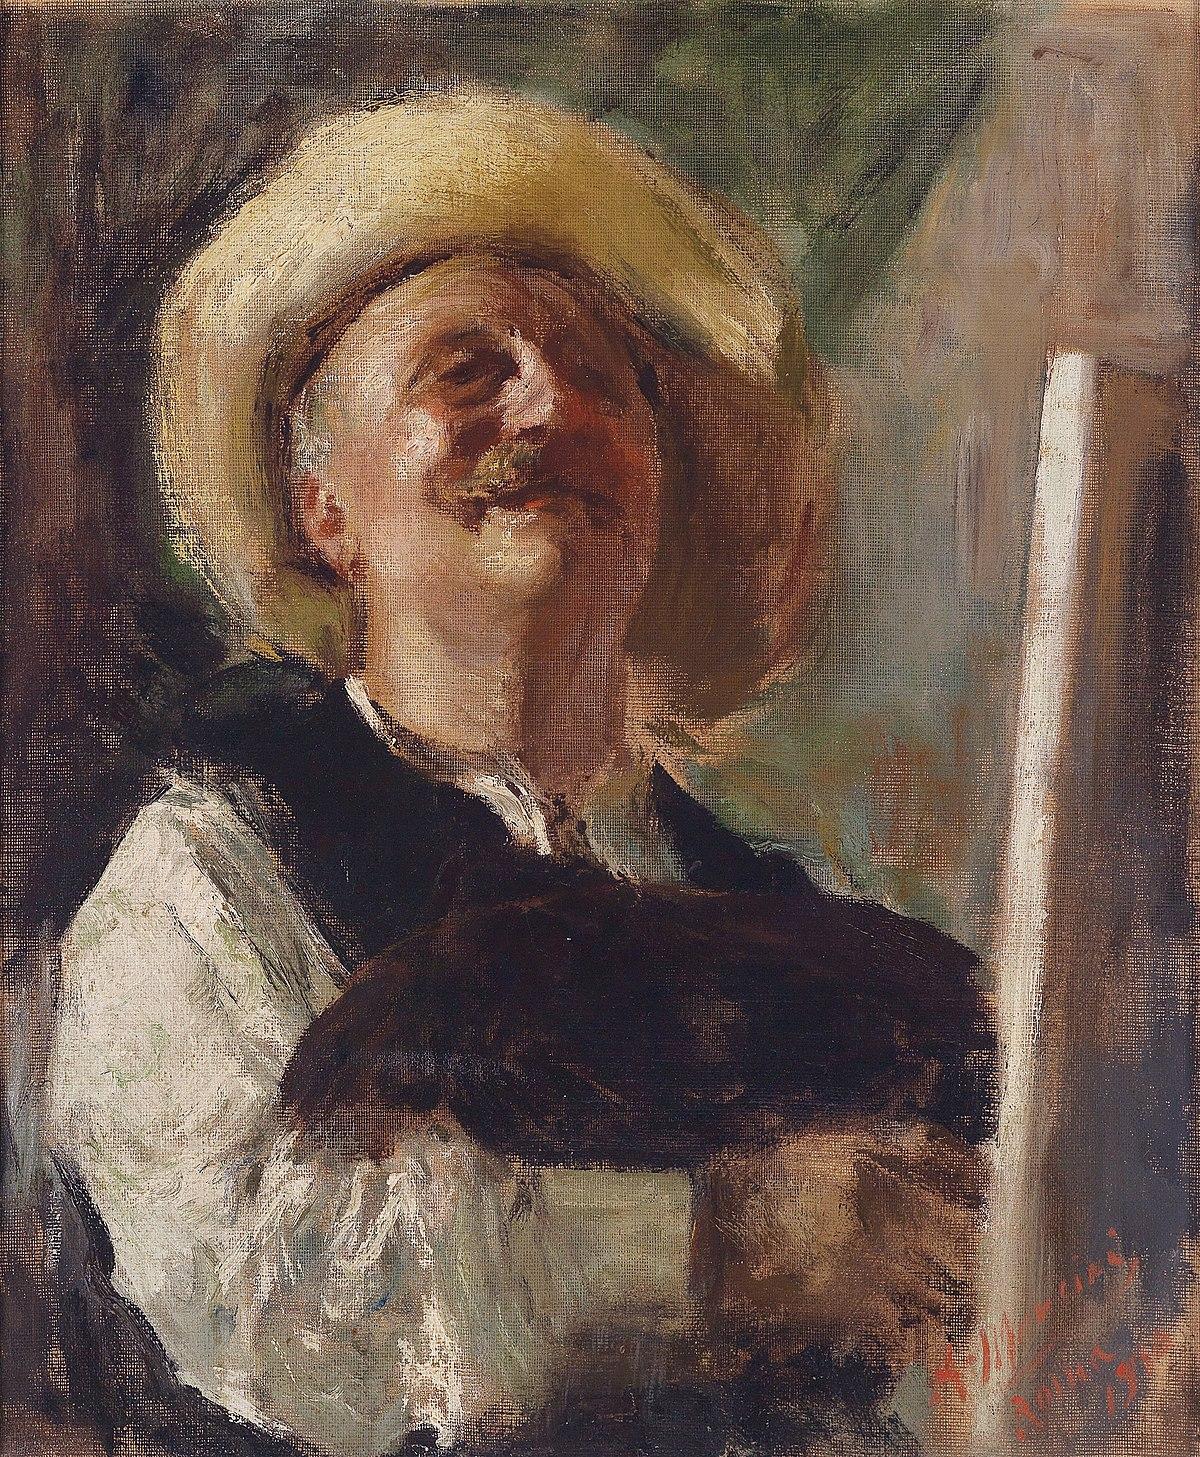 Antonio Mancini - Artist, Fine Art Prices, Auction Records for ...